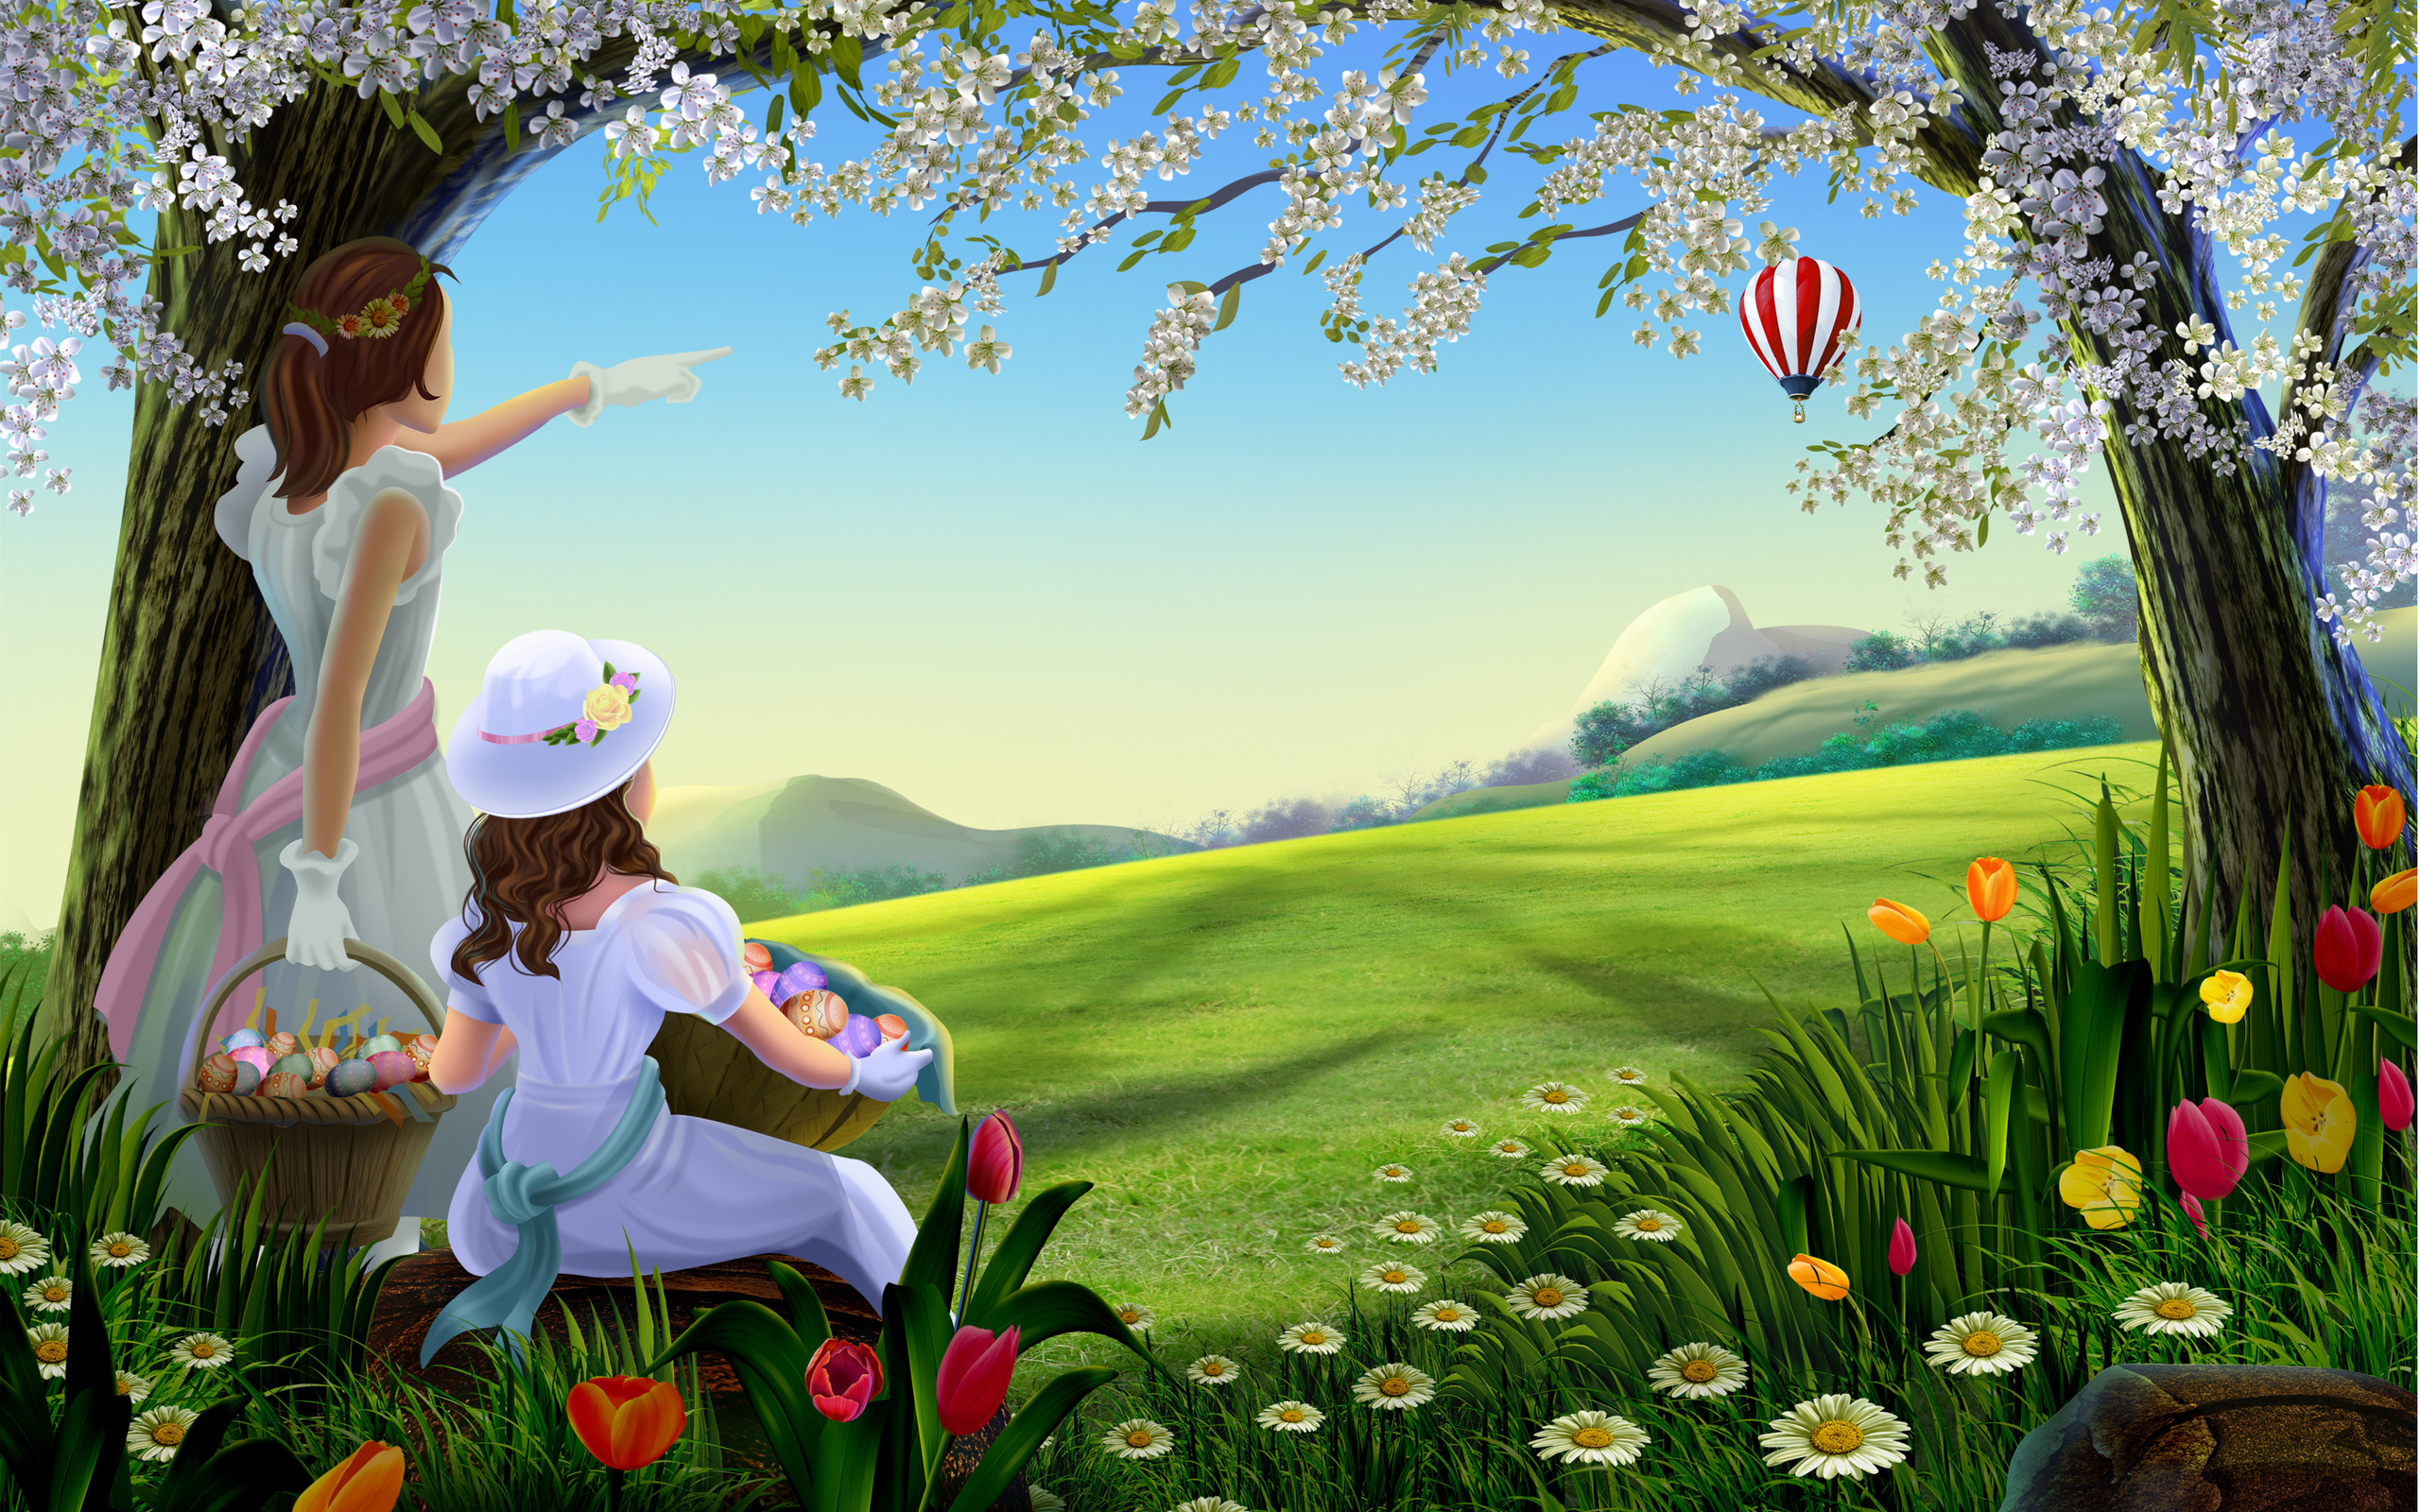 Easter Desktop Background   Wallpaper High Definition High Quality 2560x1600